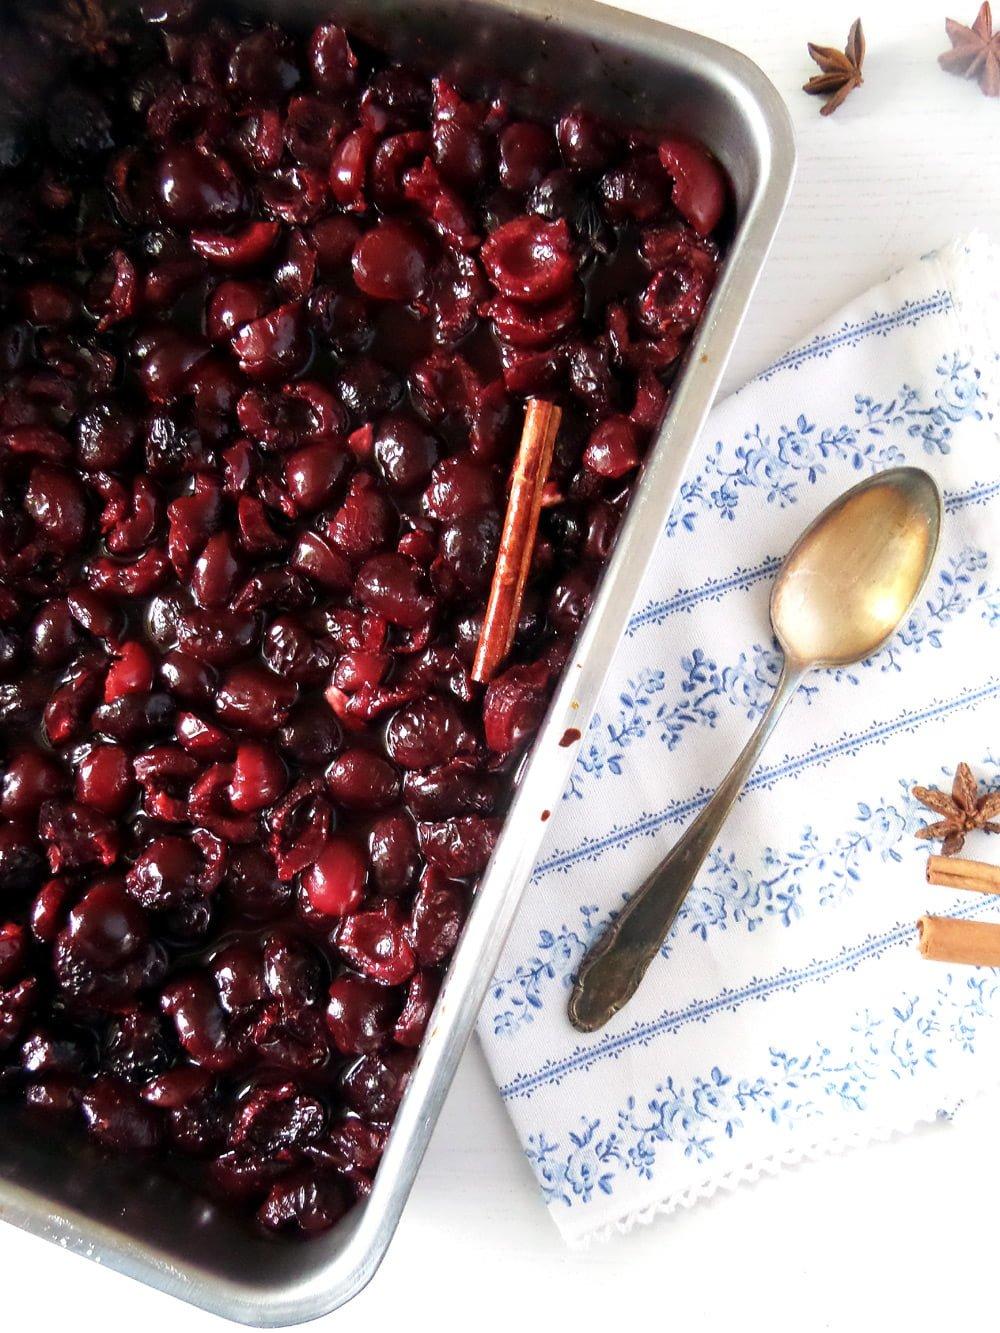 poached cherries Roasted Sweet Cherries with Cinnamon and Strained Yogurt